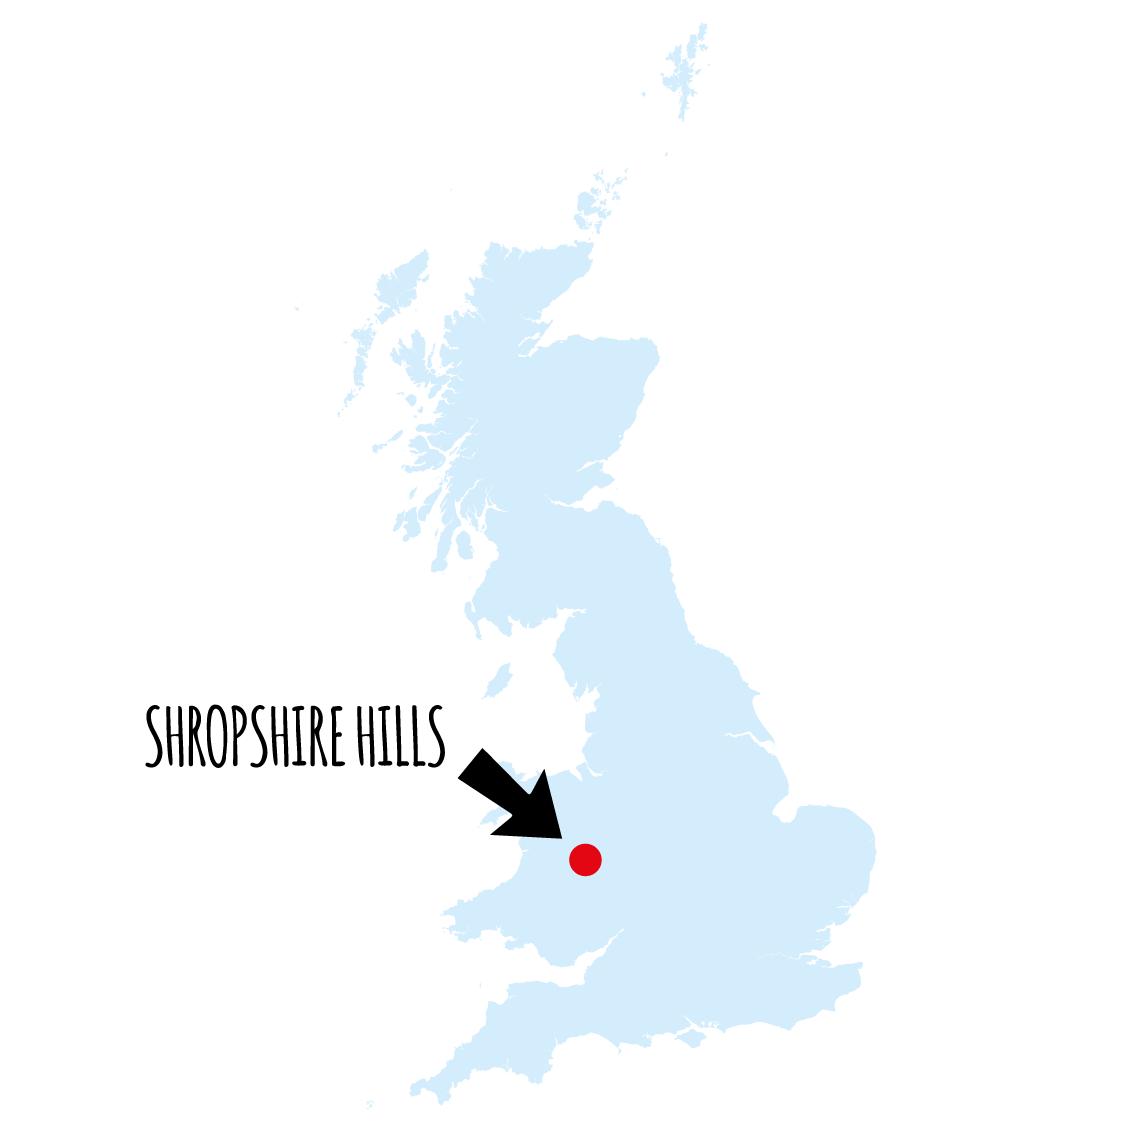 shropshire-hills-map.png